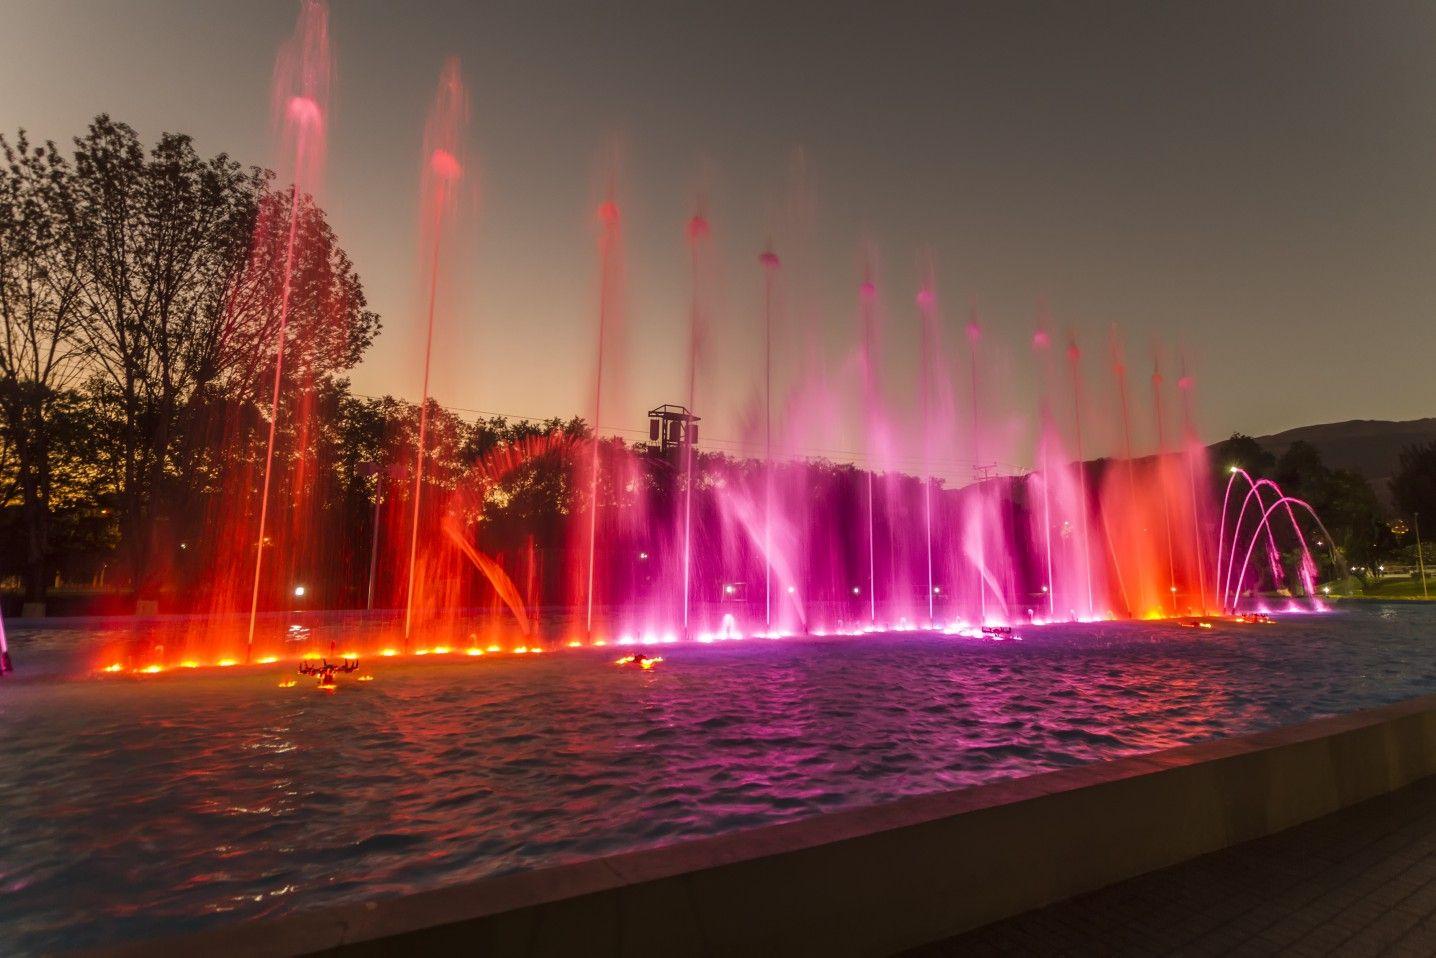 Parque De Aguas Danzantes Cochabamba Foto Direccion De Turismo Del Municipio Gamc Waterfall Outdoor Water